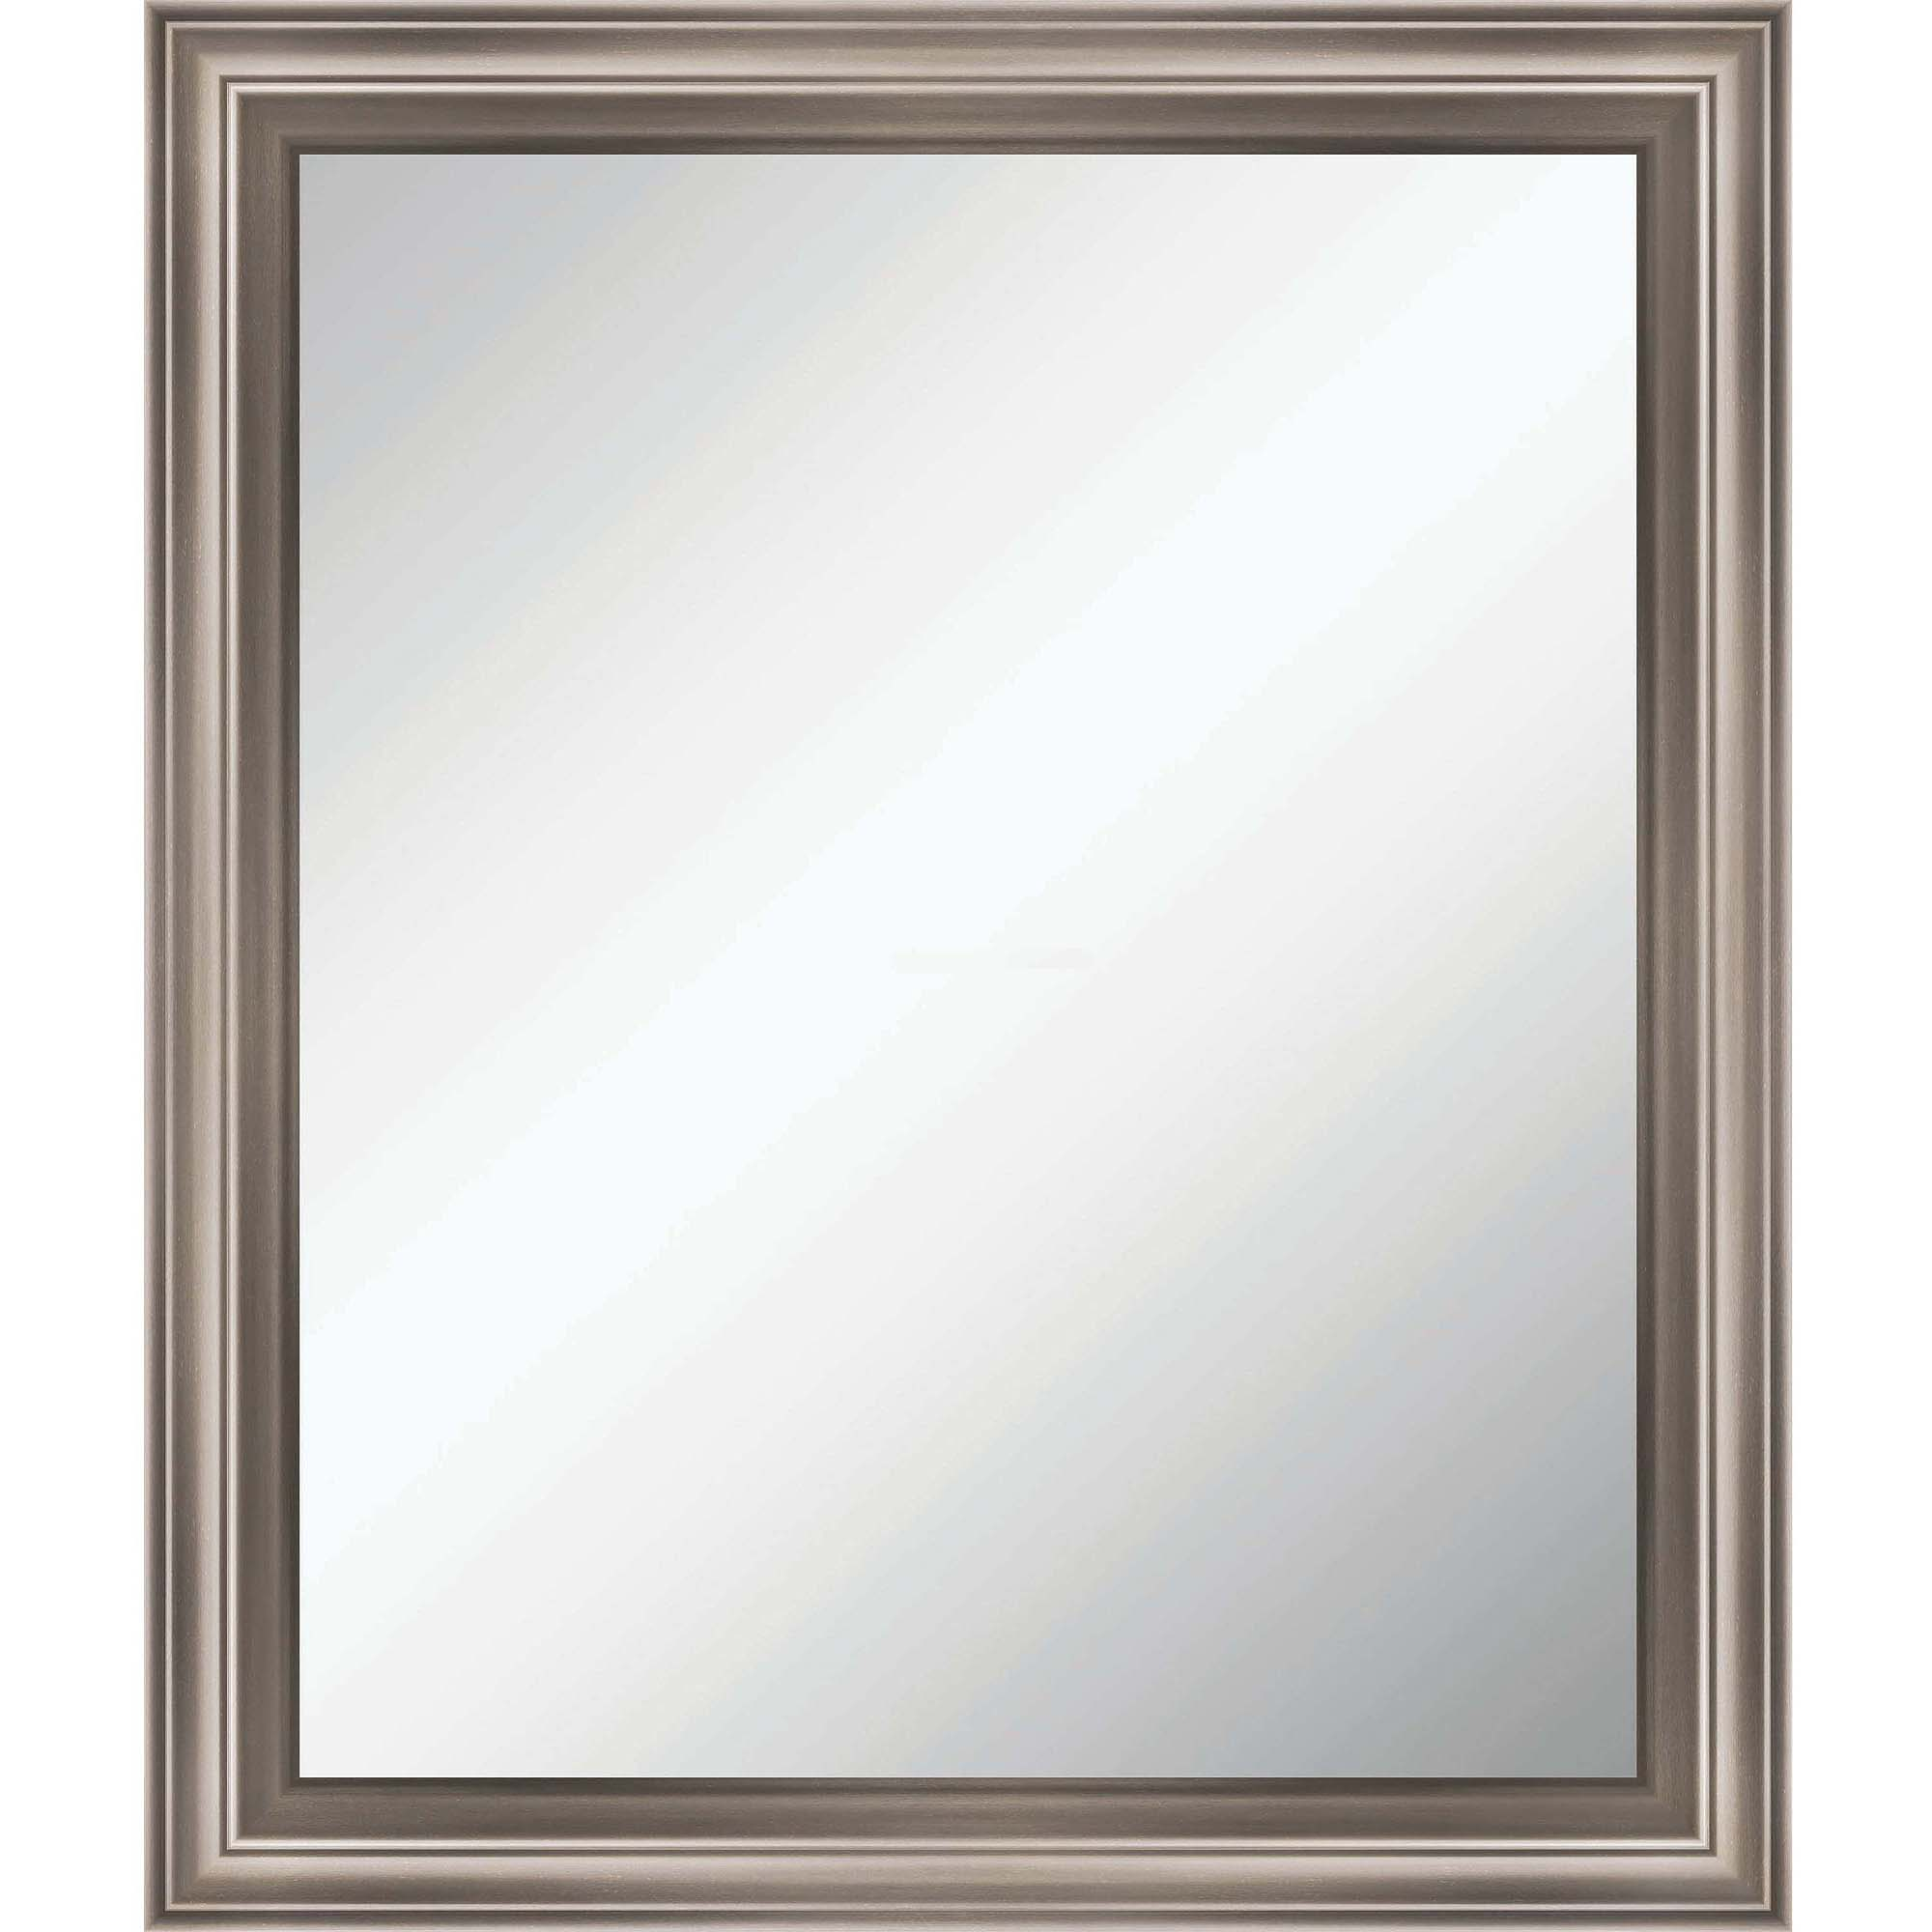 Bevelled Bathroom Mirror Better Homes And Gardens 20 X 20 Sawyer Beveled Mirror Walmartcom